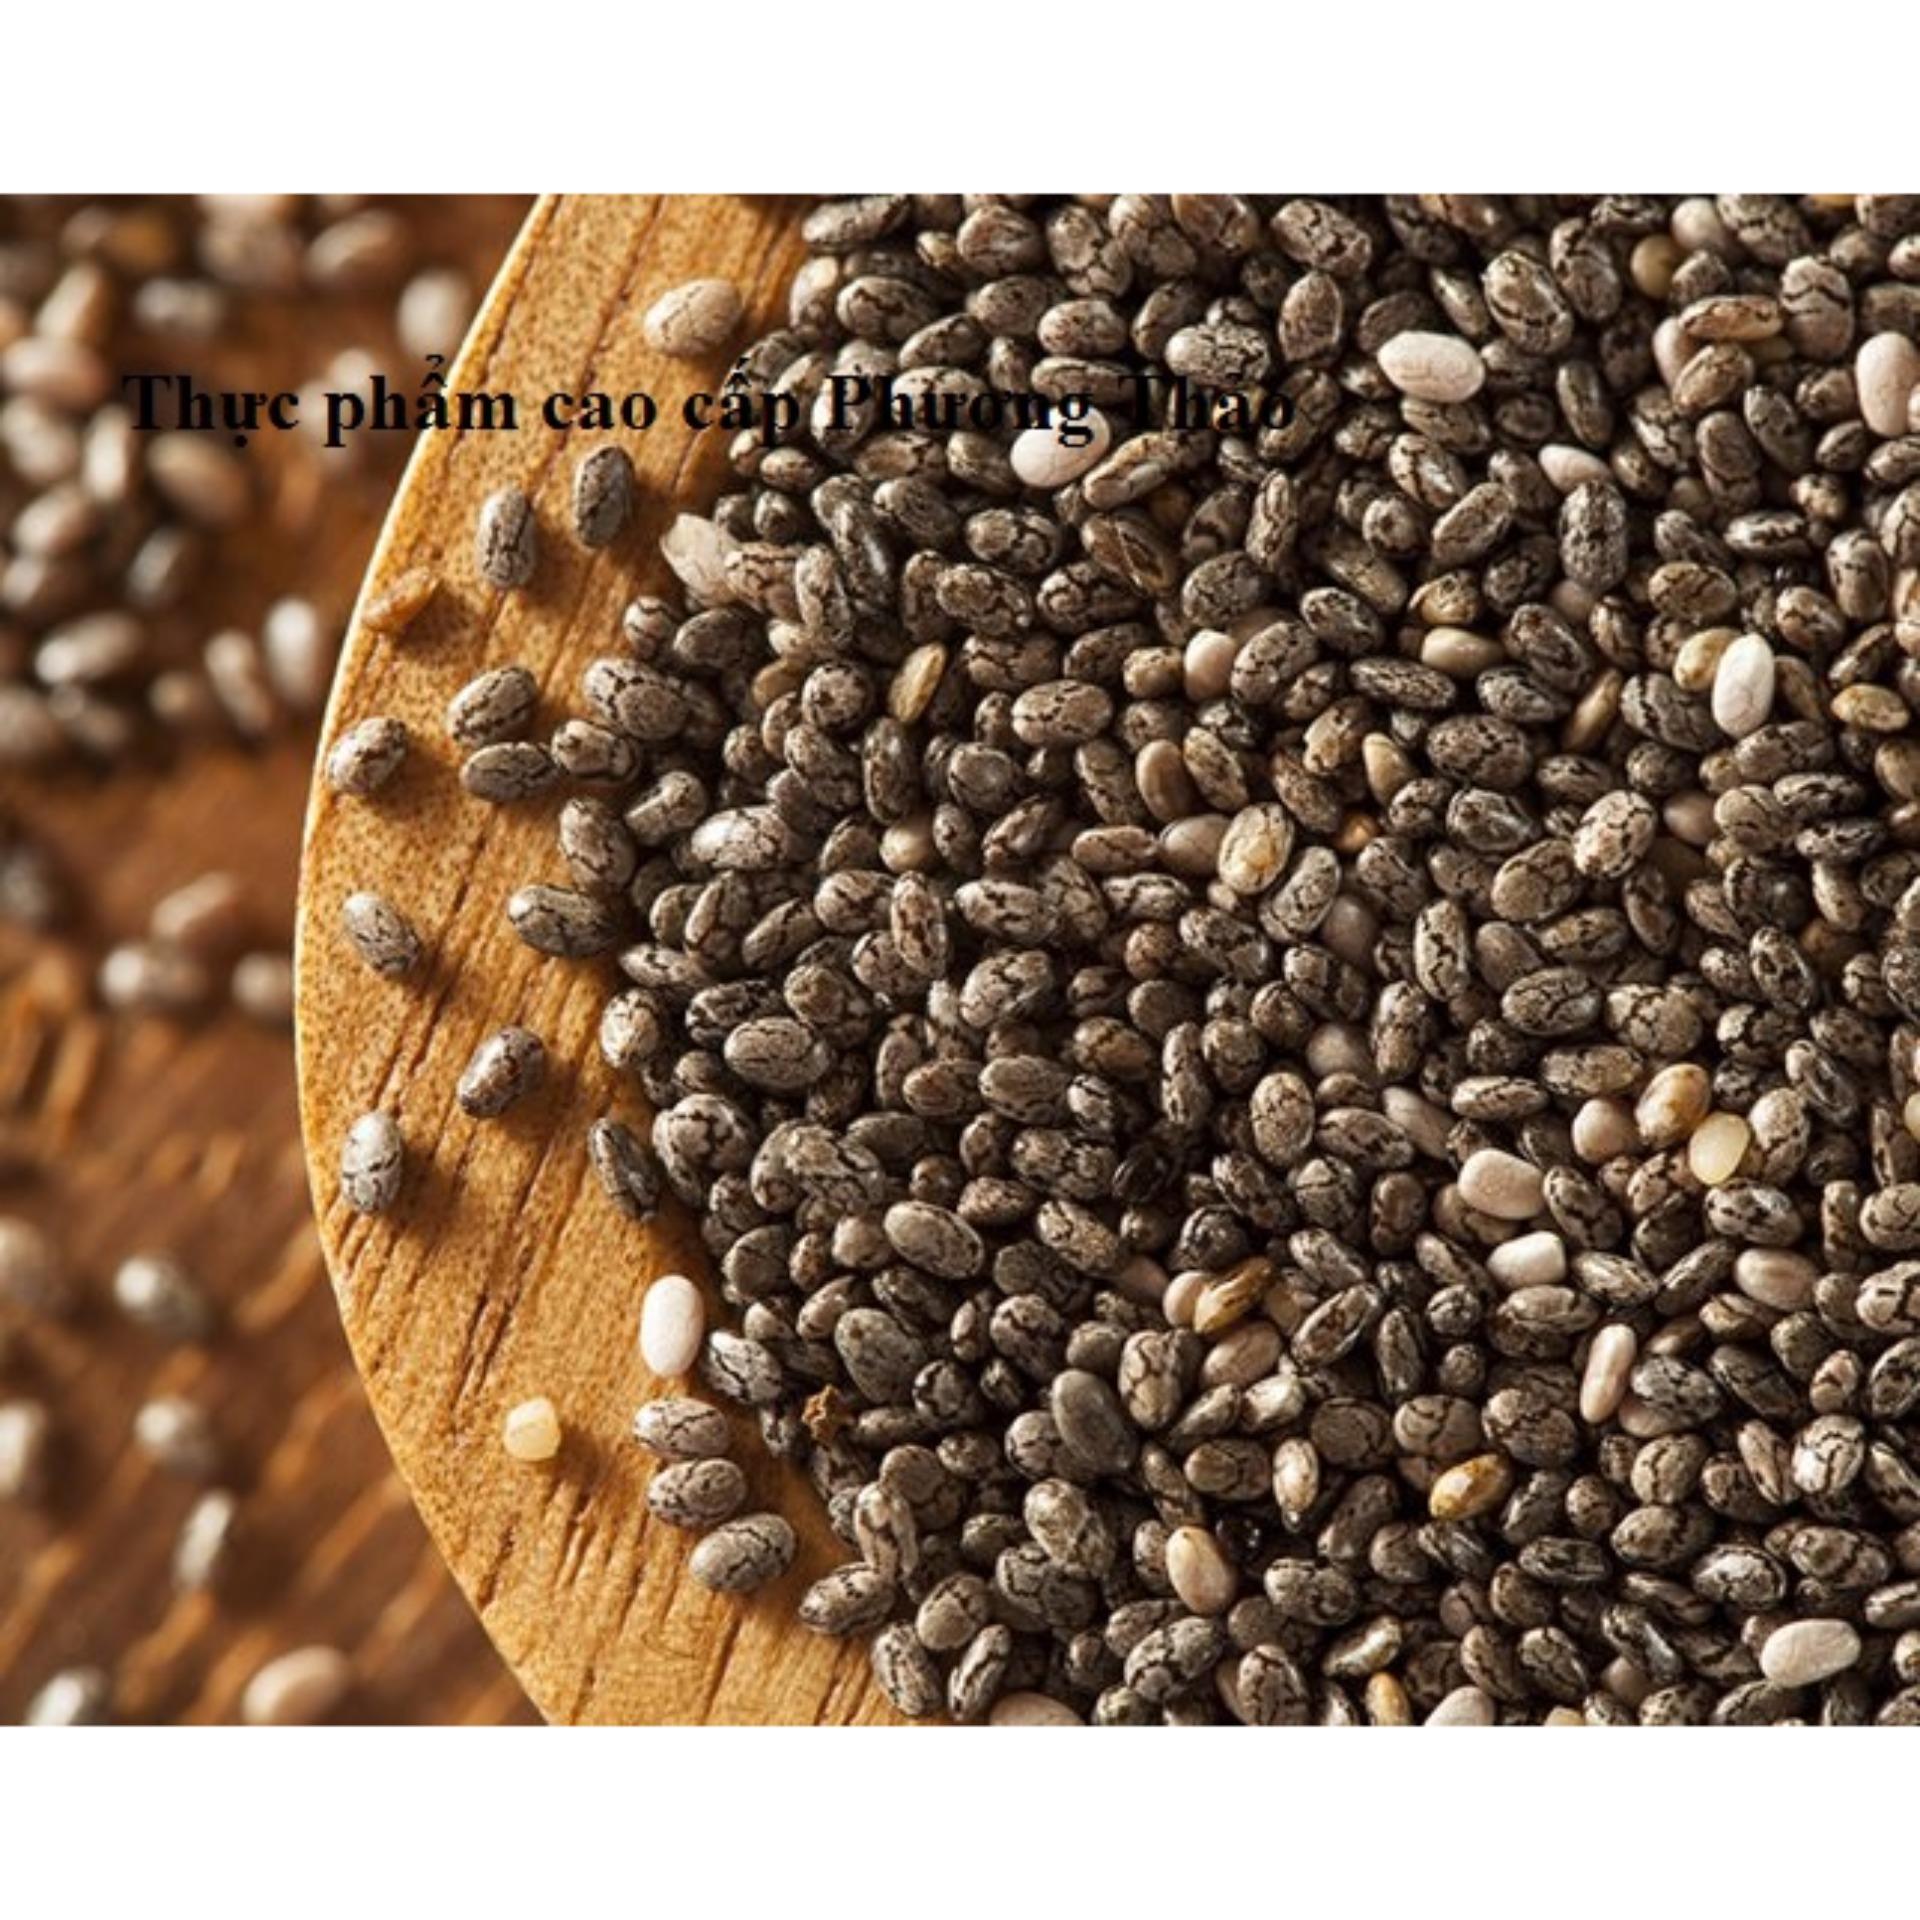 Hot Discount Ht Chia Organic Black Bag 1kg Nhp C Seeds 1 Kg